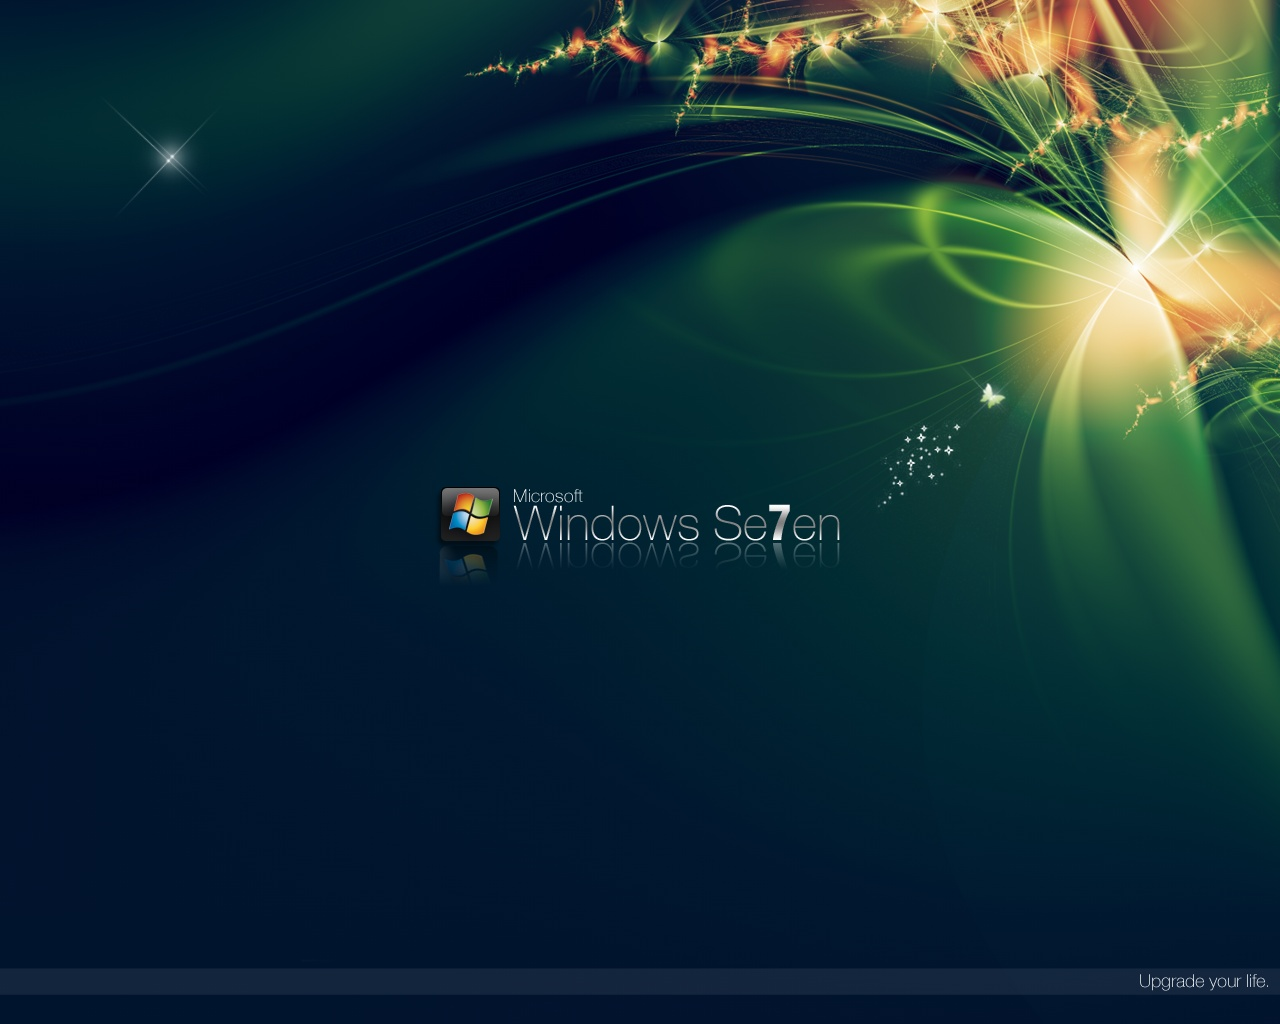 Green Windows 7 Wallpapers 11839 1280x1024